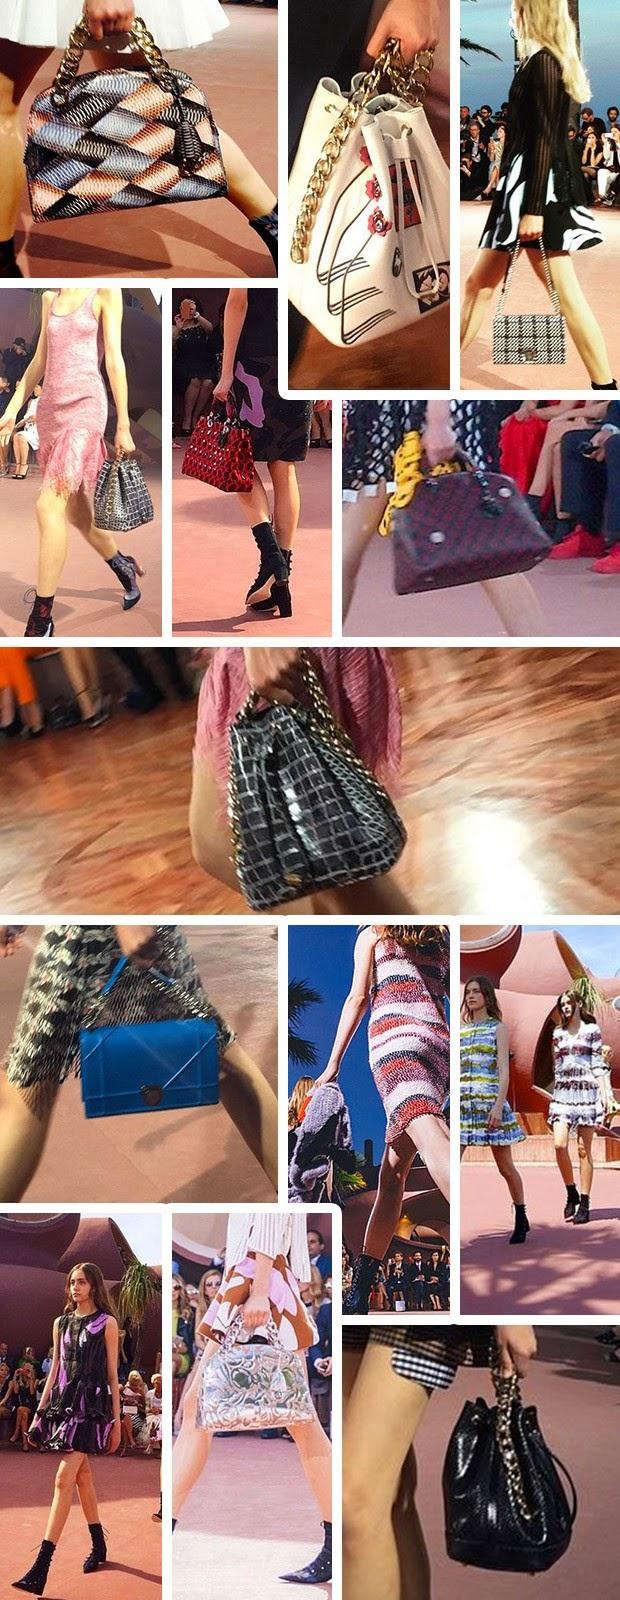 noticias de moda